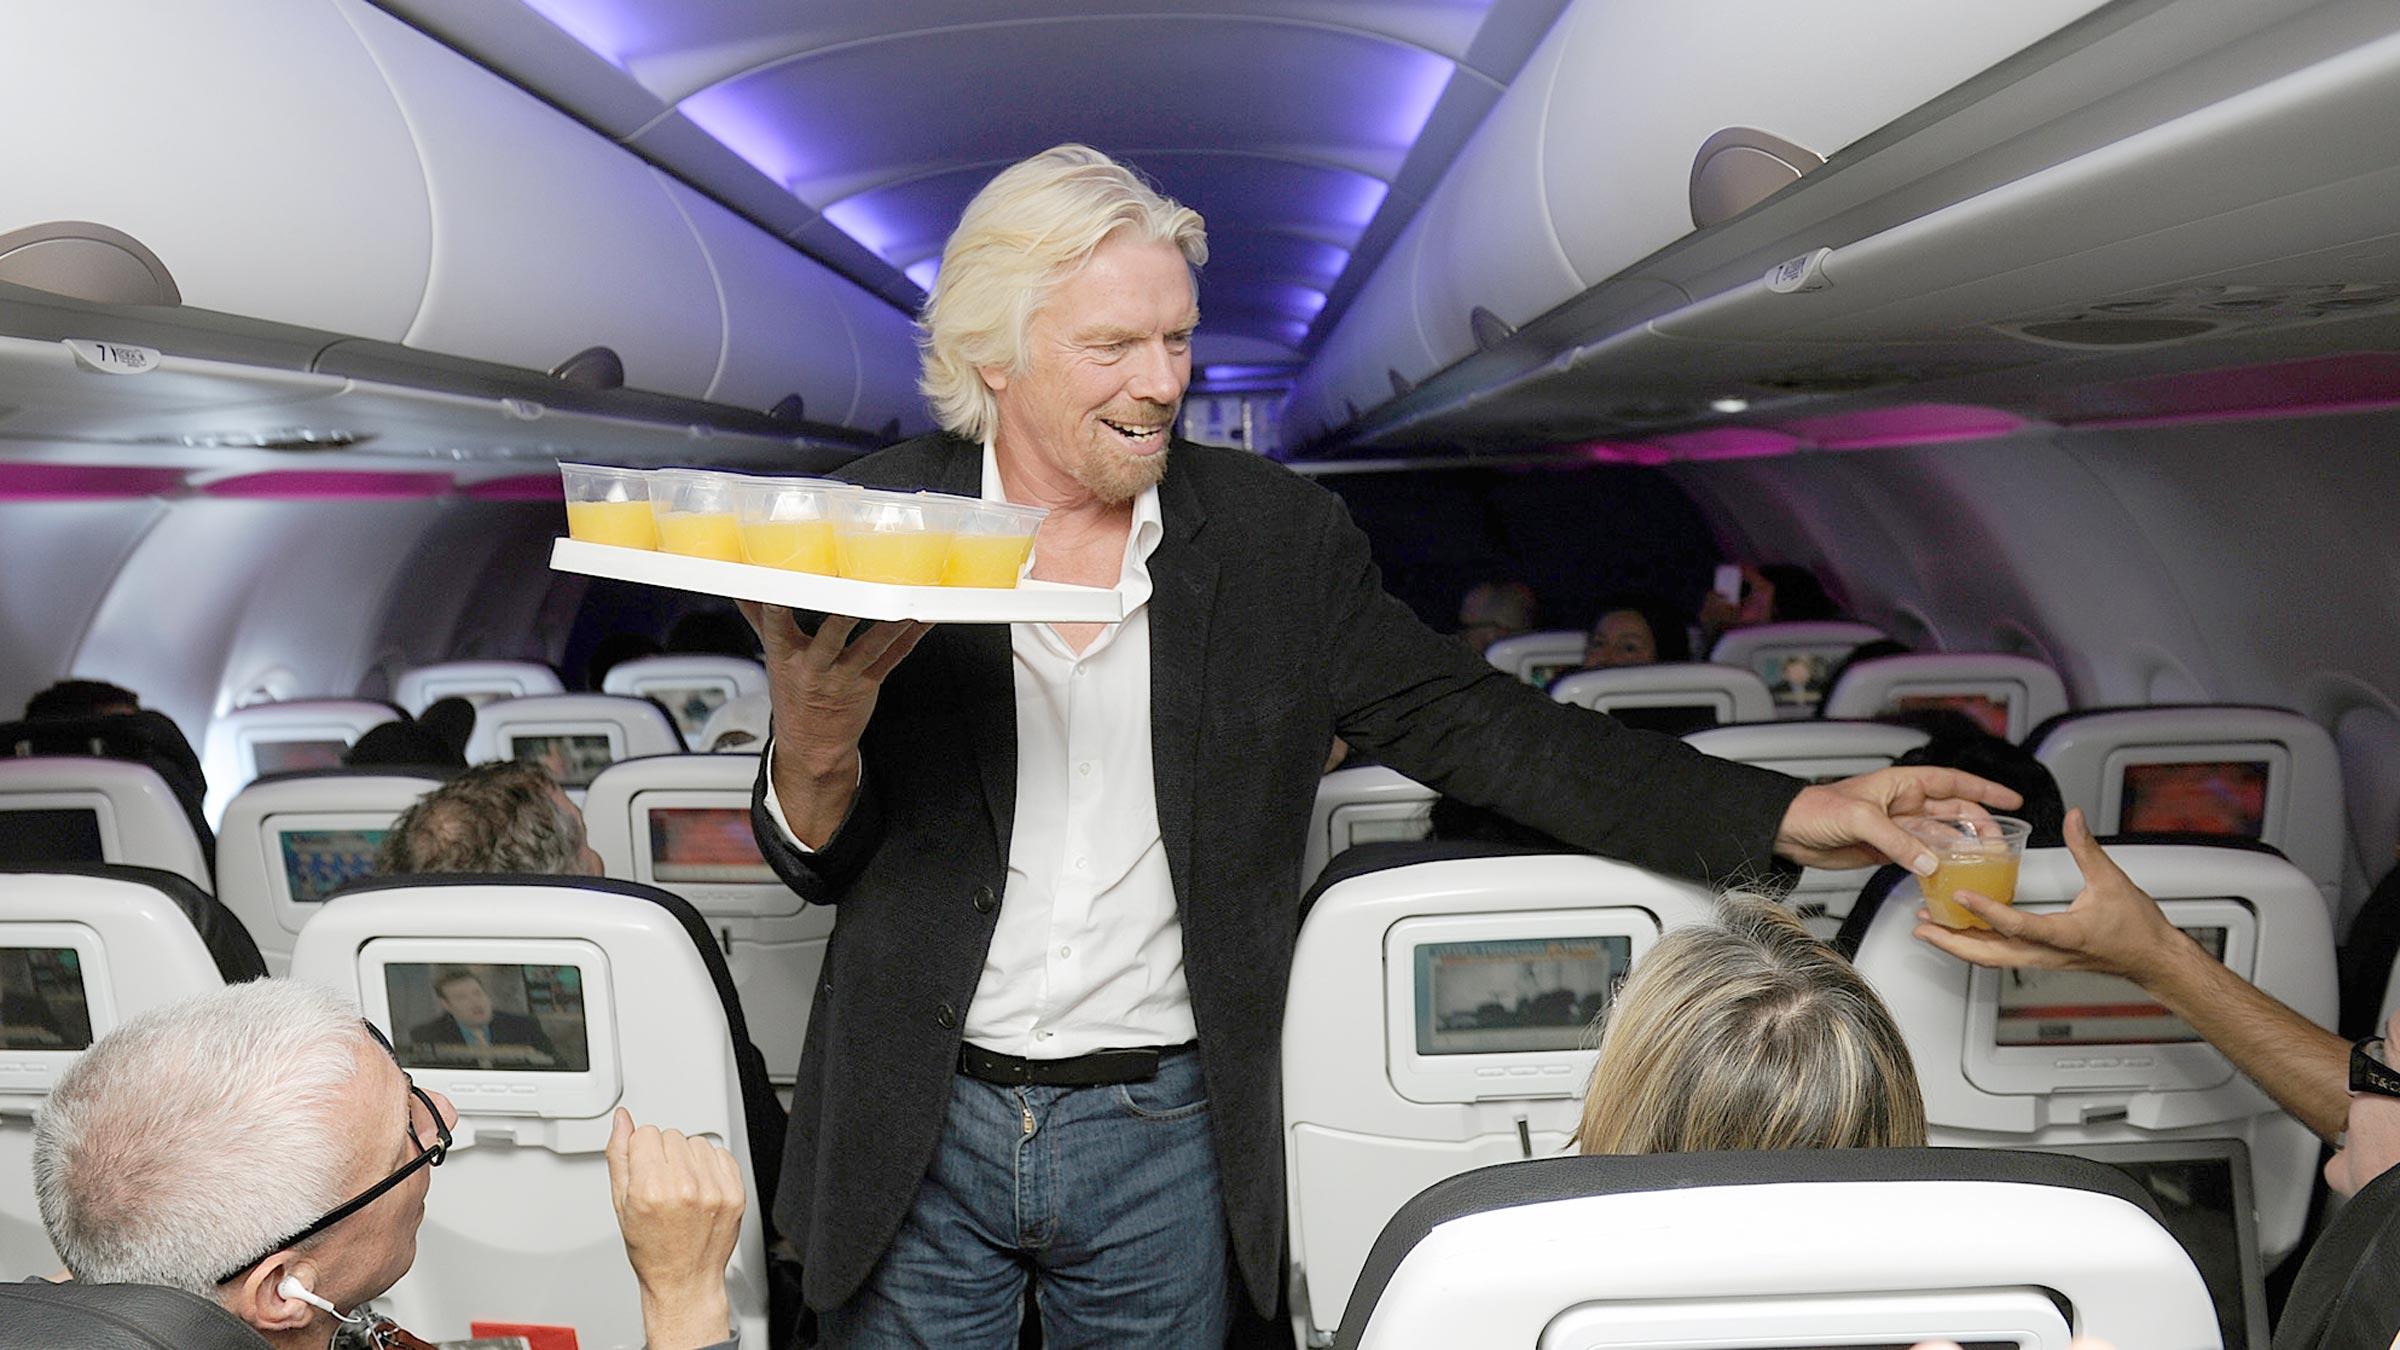 Richard Branson hands out orange juice.